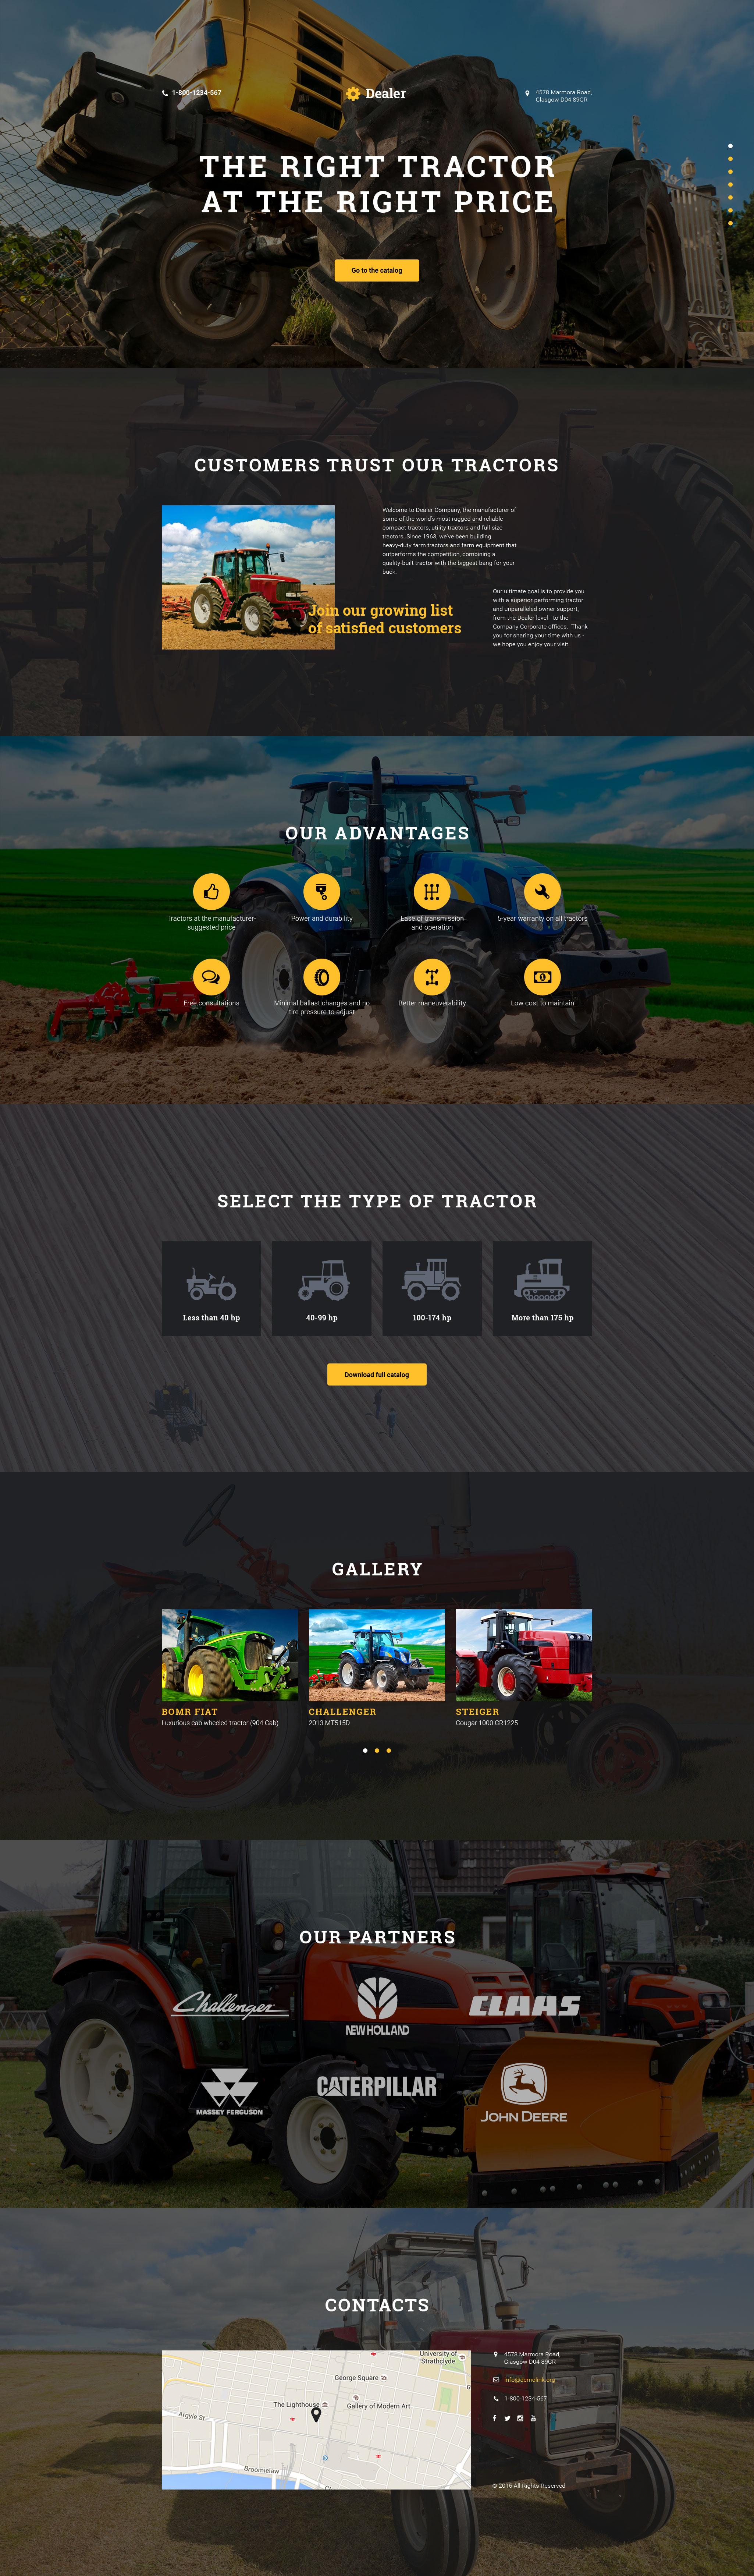 Car Dealer Responsive Landing Page Template #58220